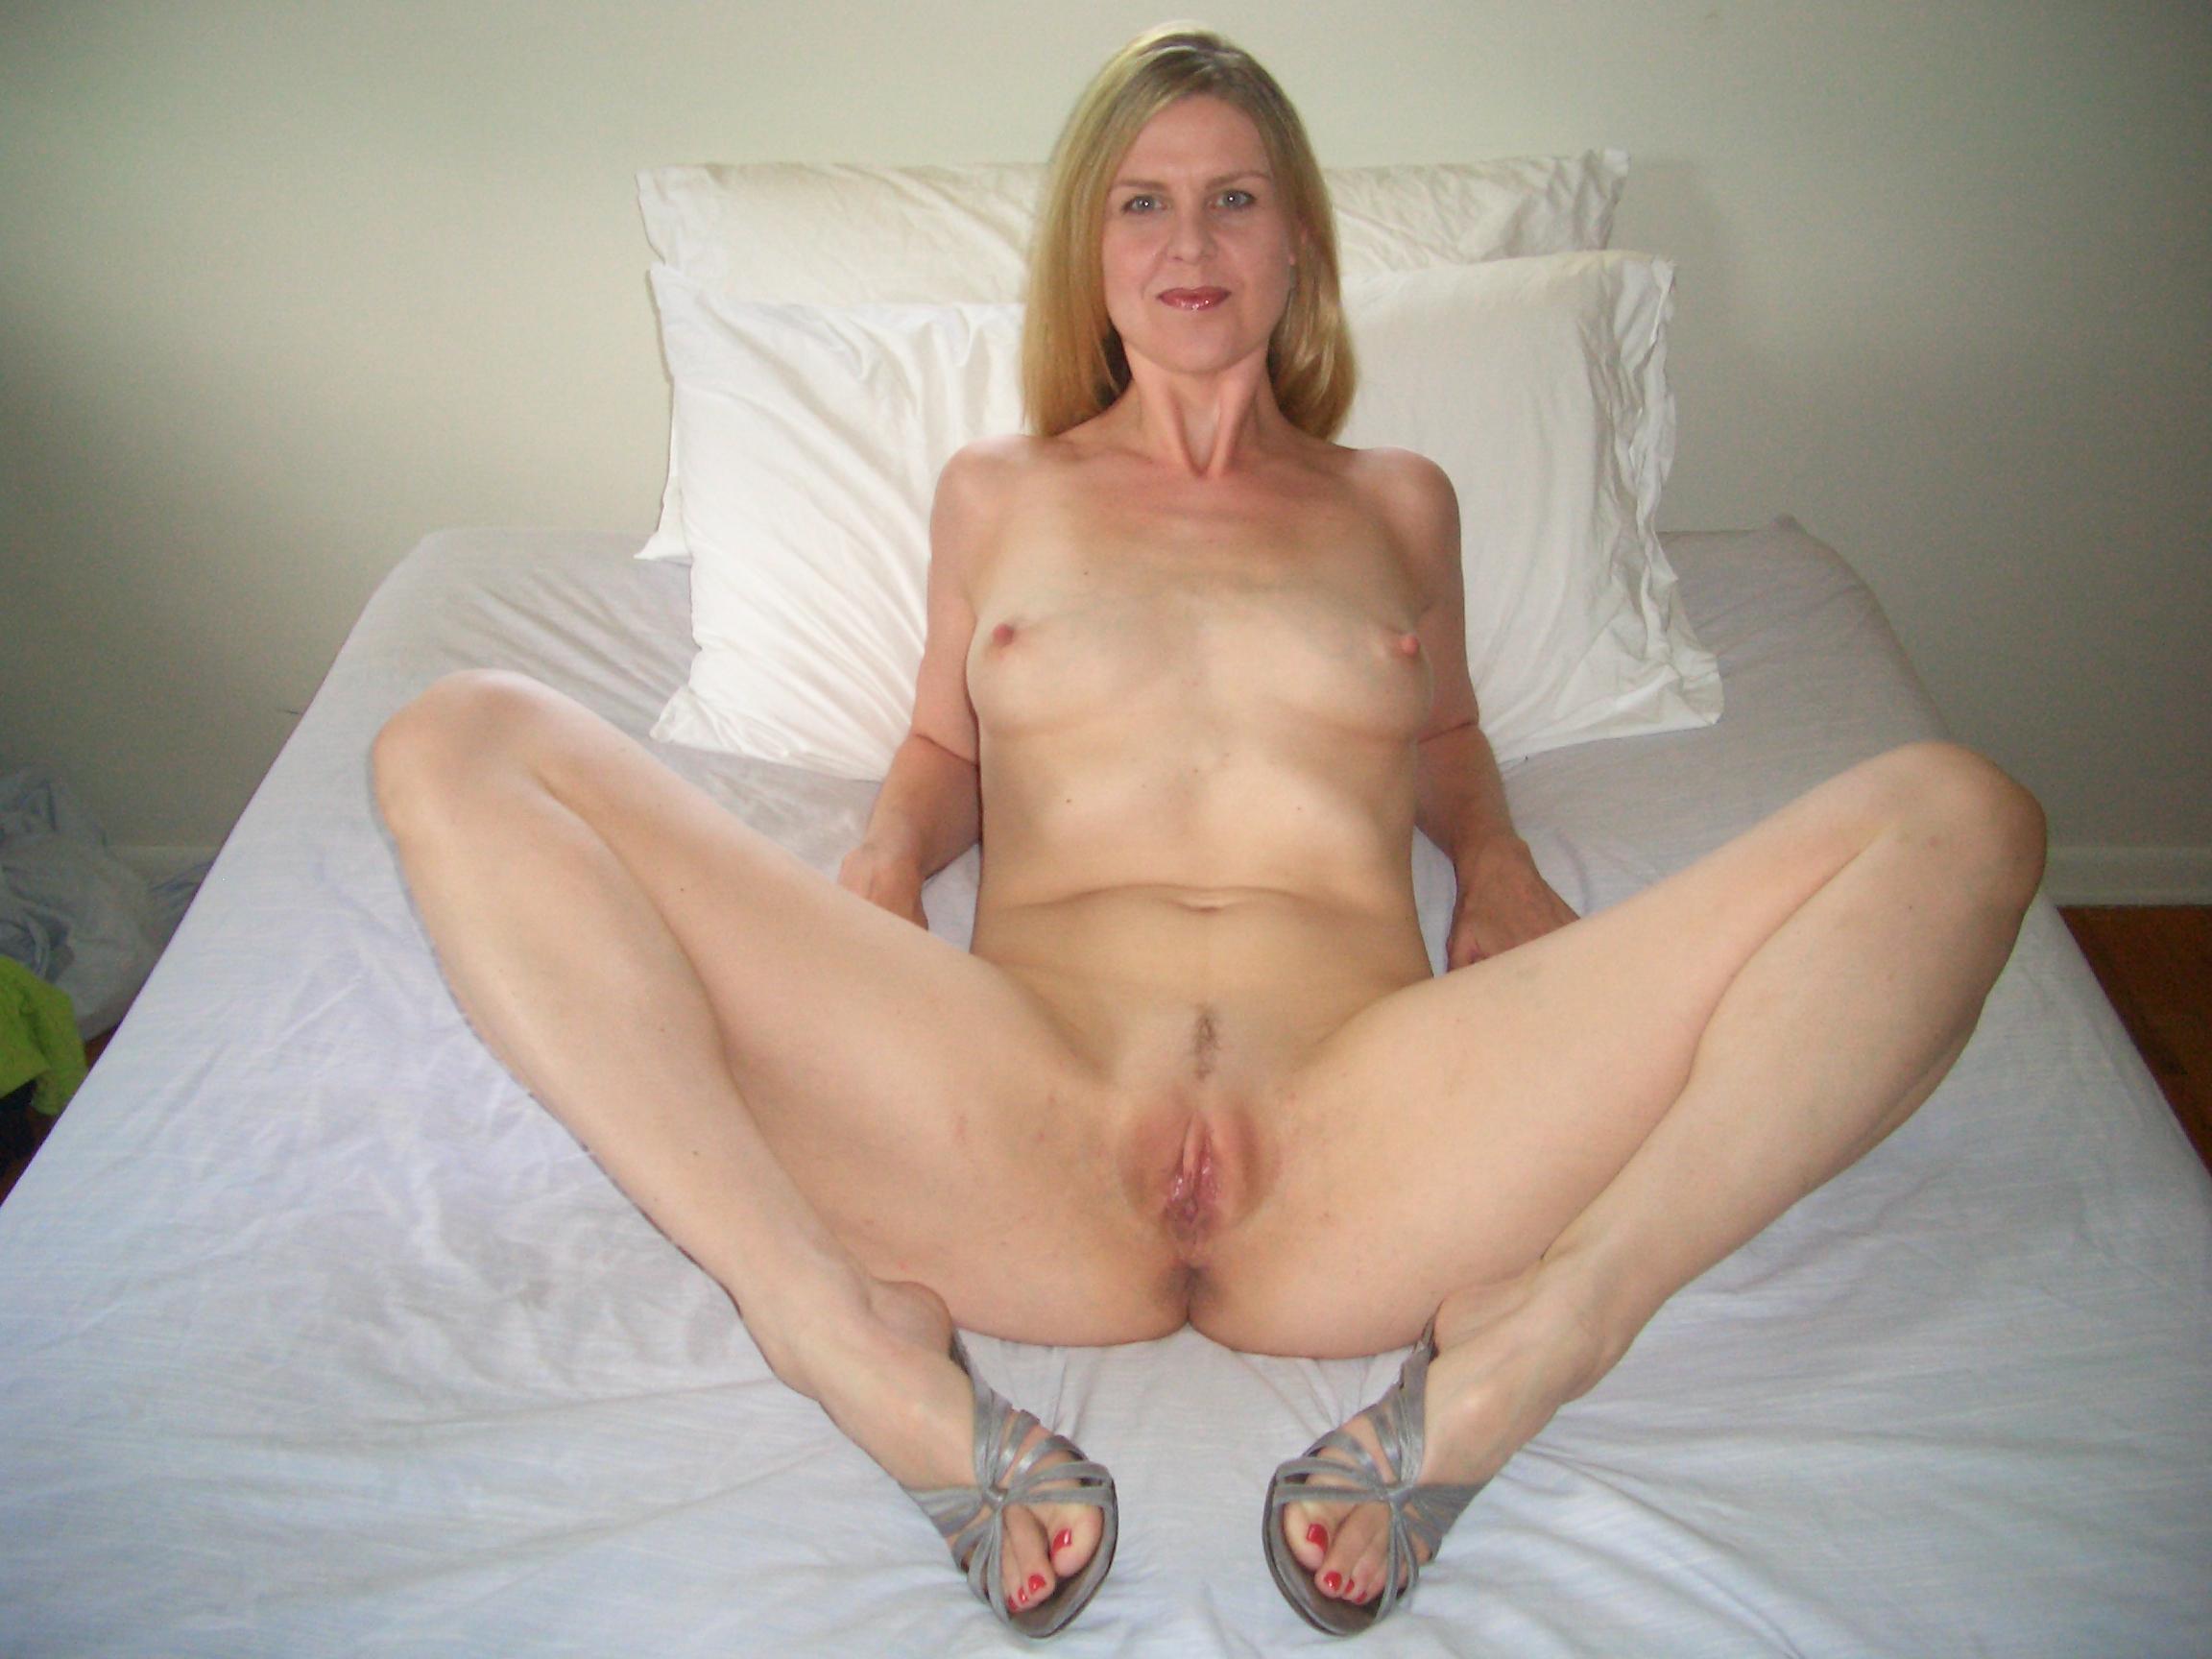 Sophie marceau fakes